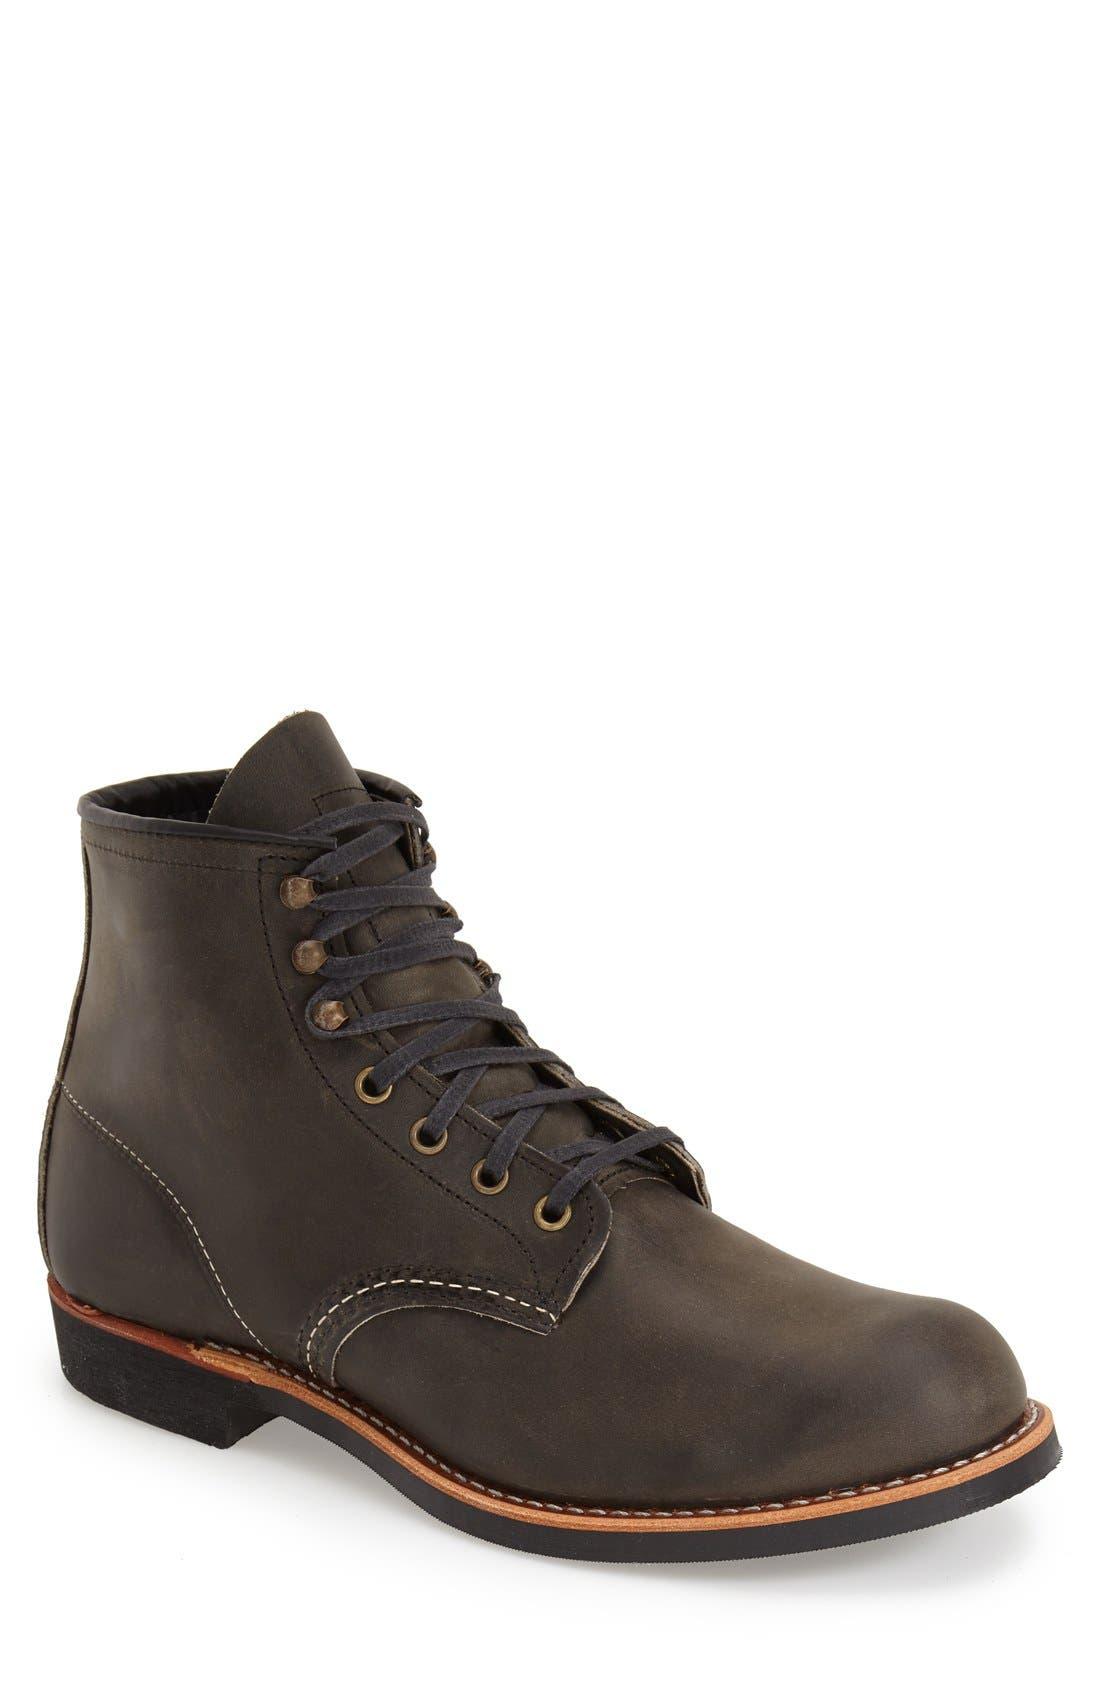 Blacksmith Boot,                             Main thumbnail 1, color,                             CHARCOAL LEATHER